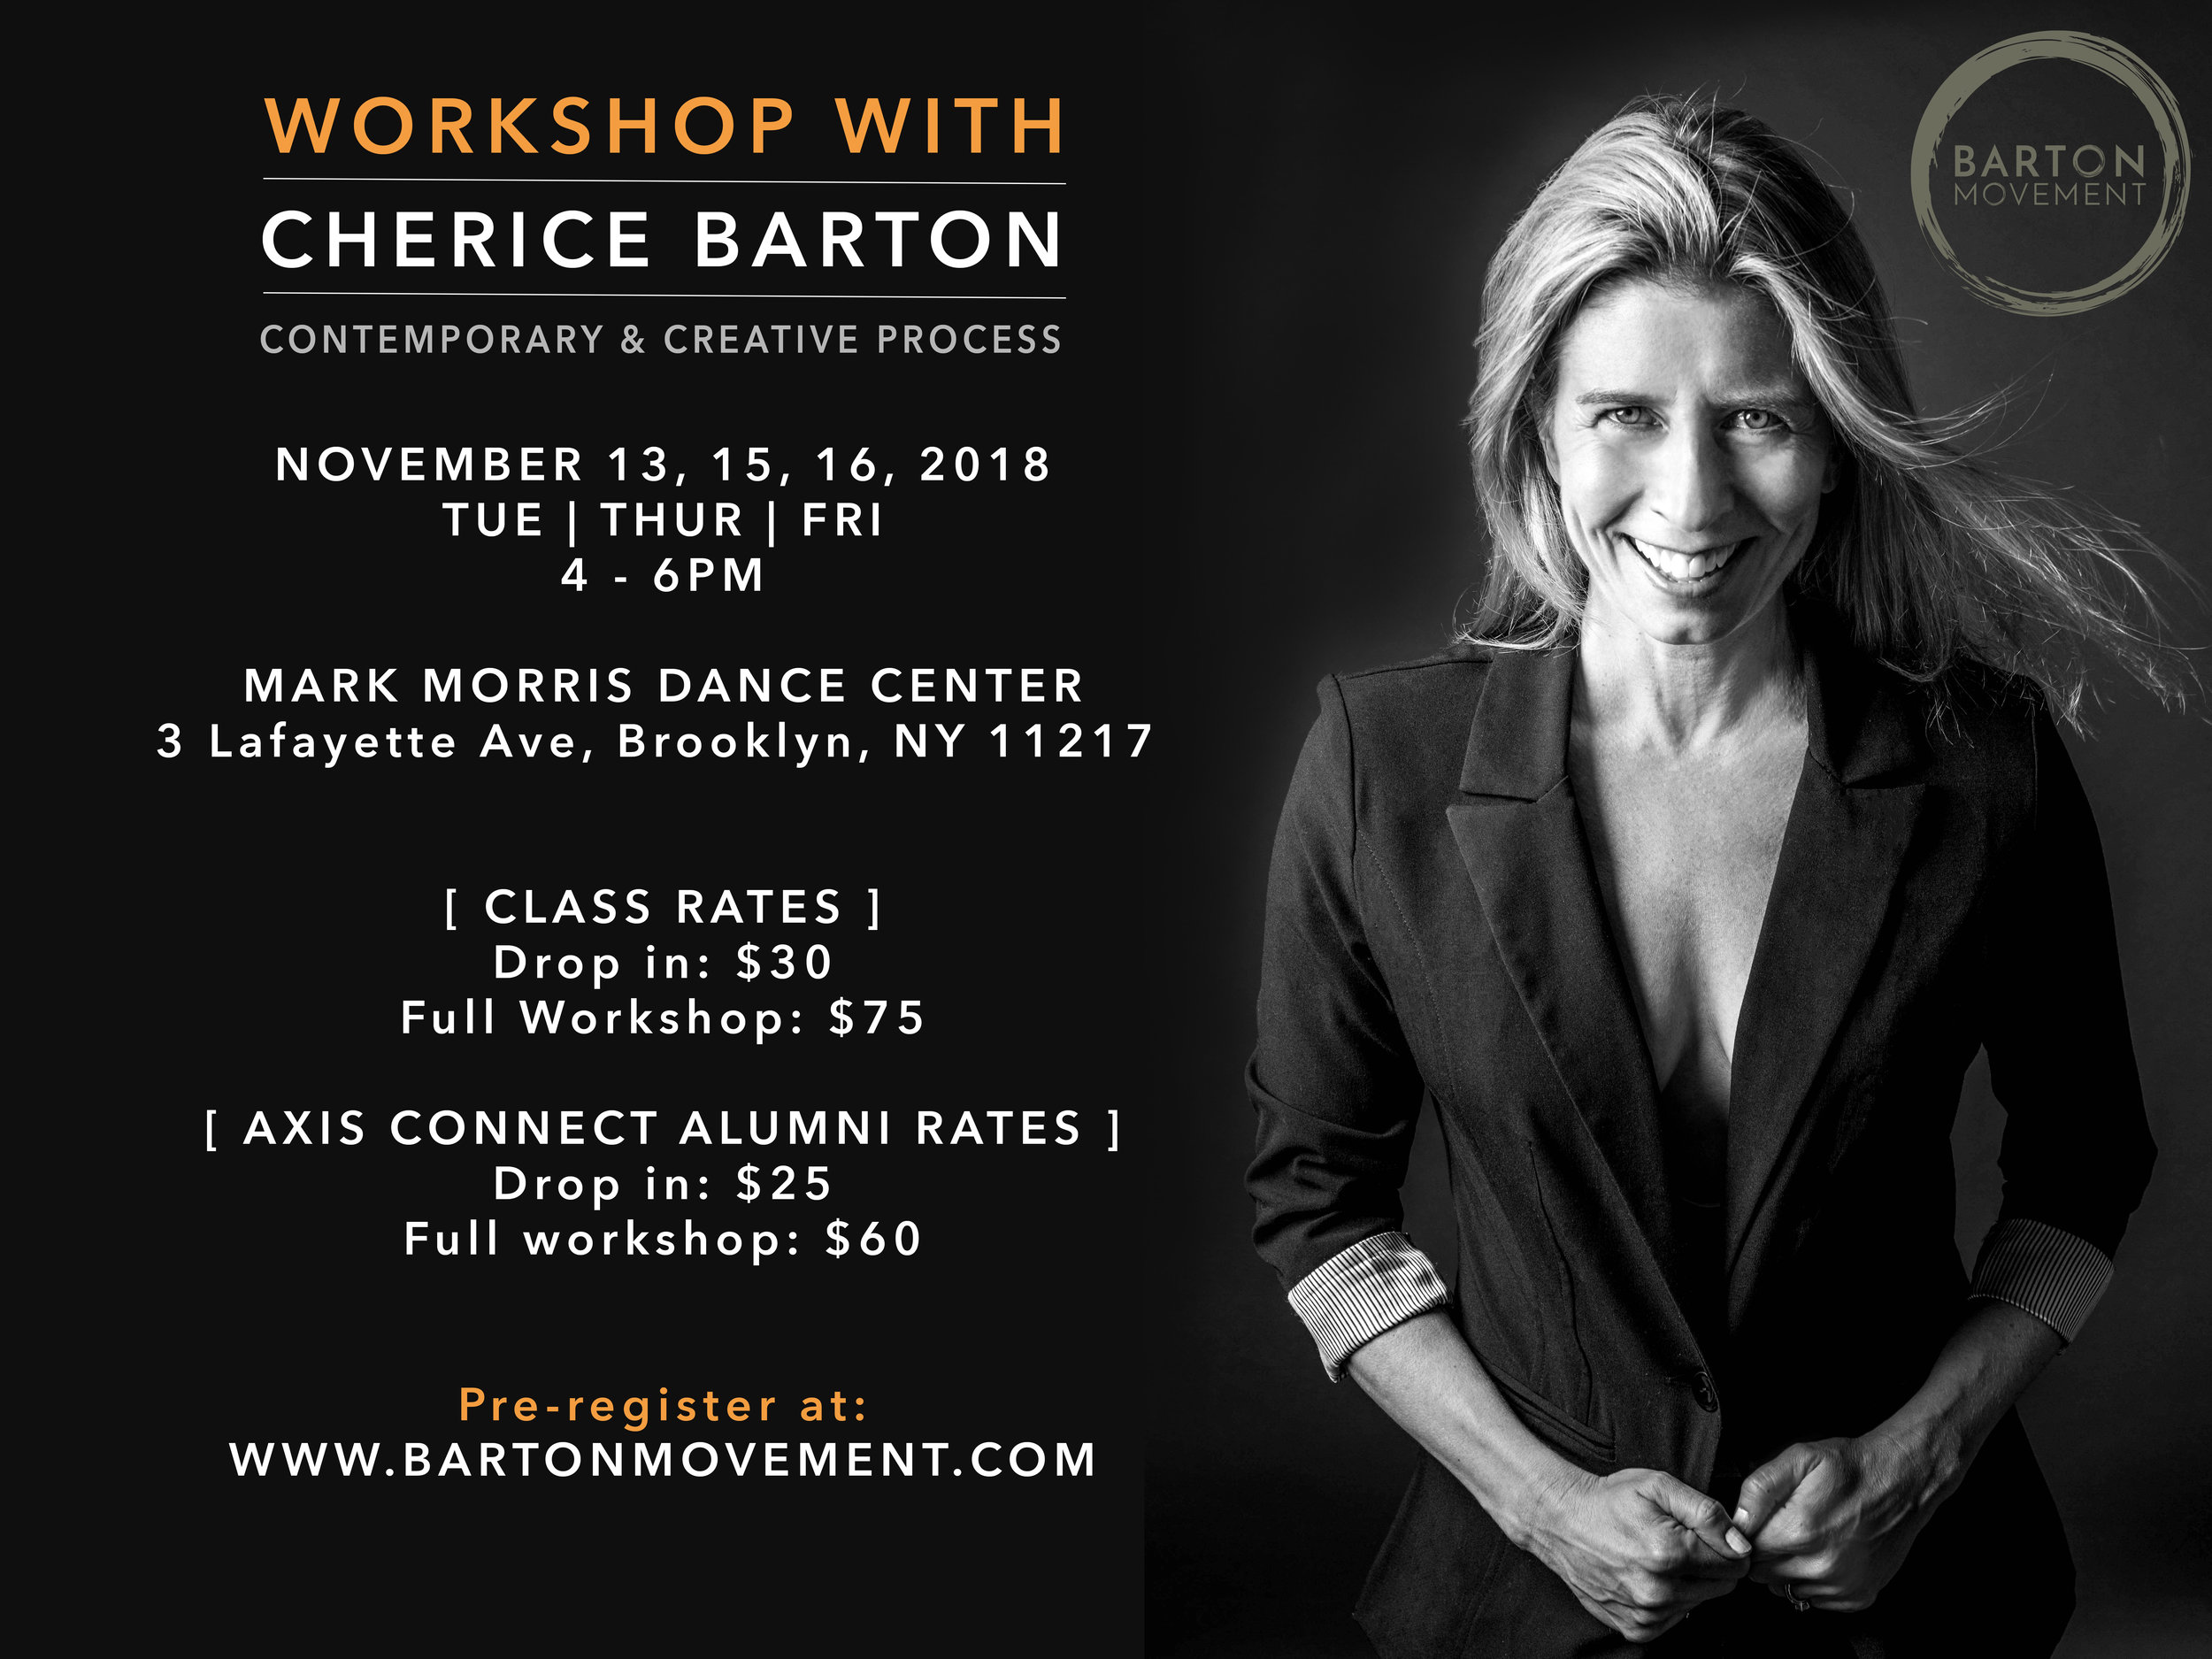 NYC Workshop with Cherice Barton